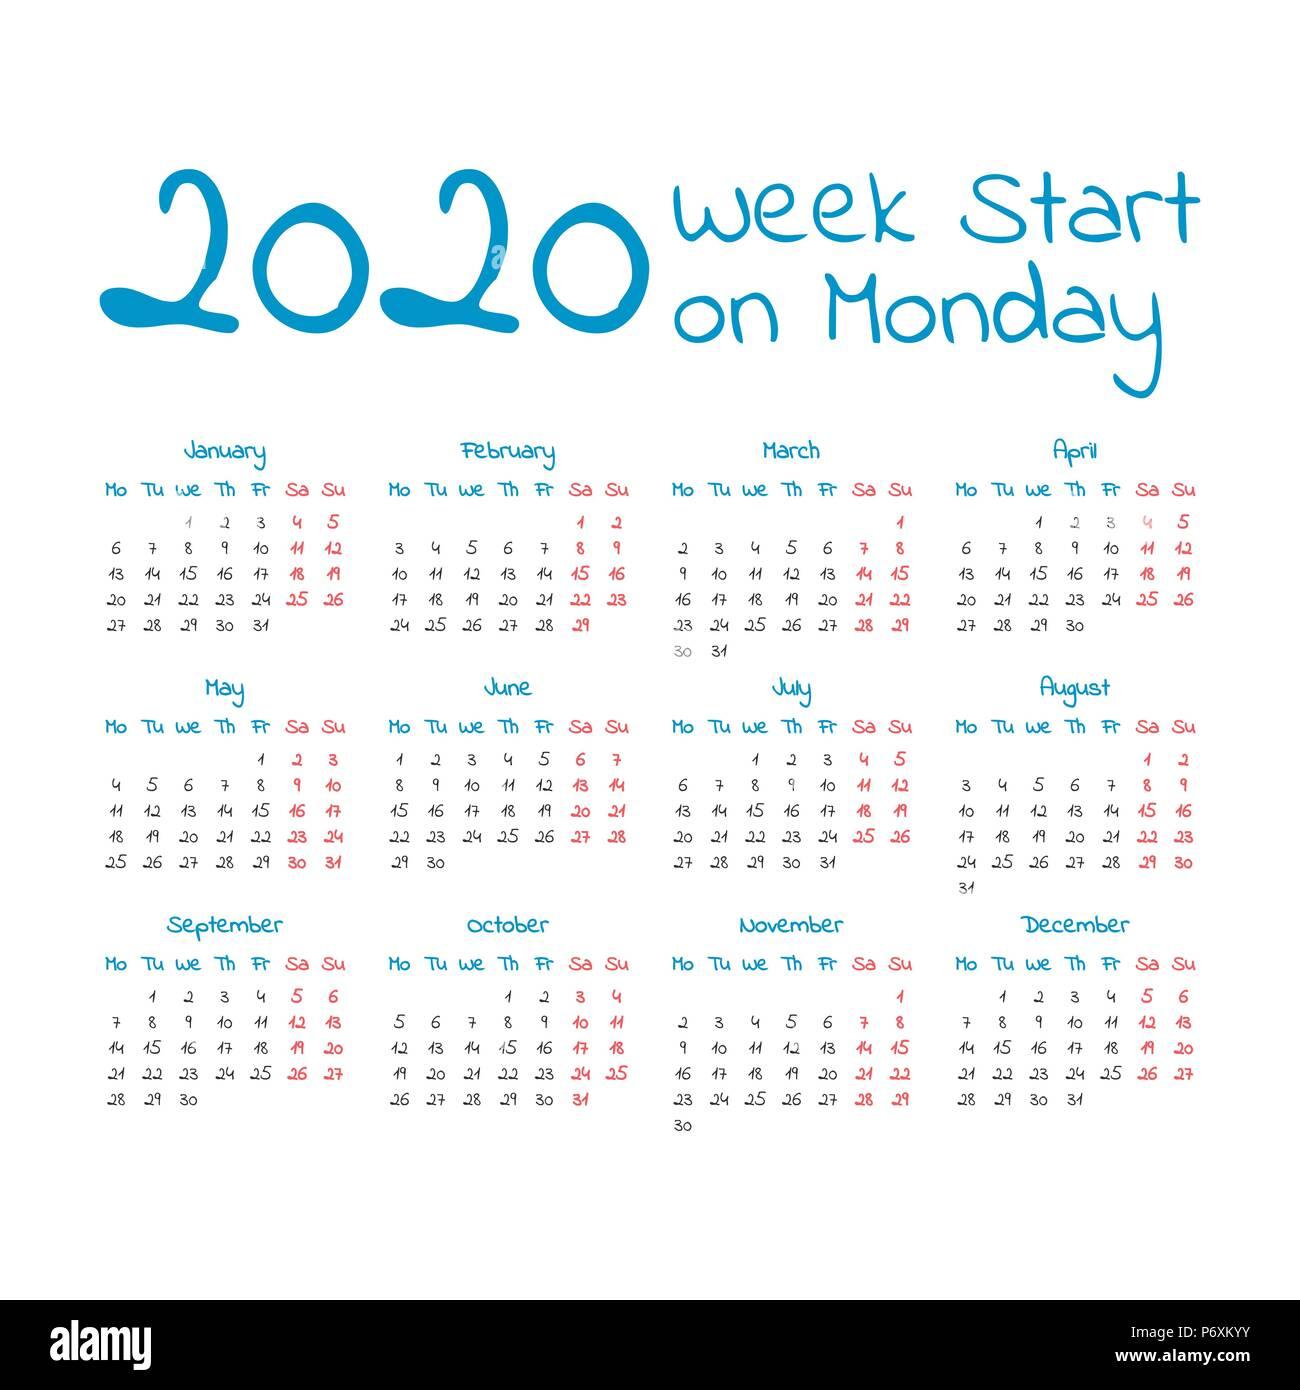 2020 Calendar Starting Monday Simple 2020 year calendar, week starts on Monday Stock Vector Art